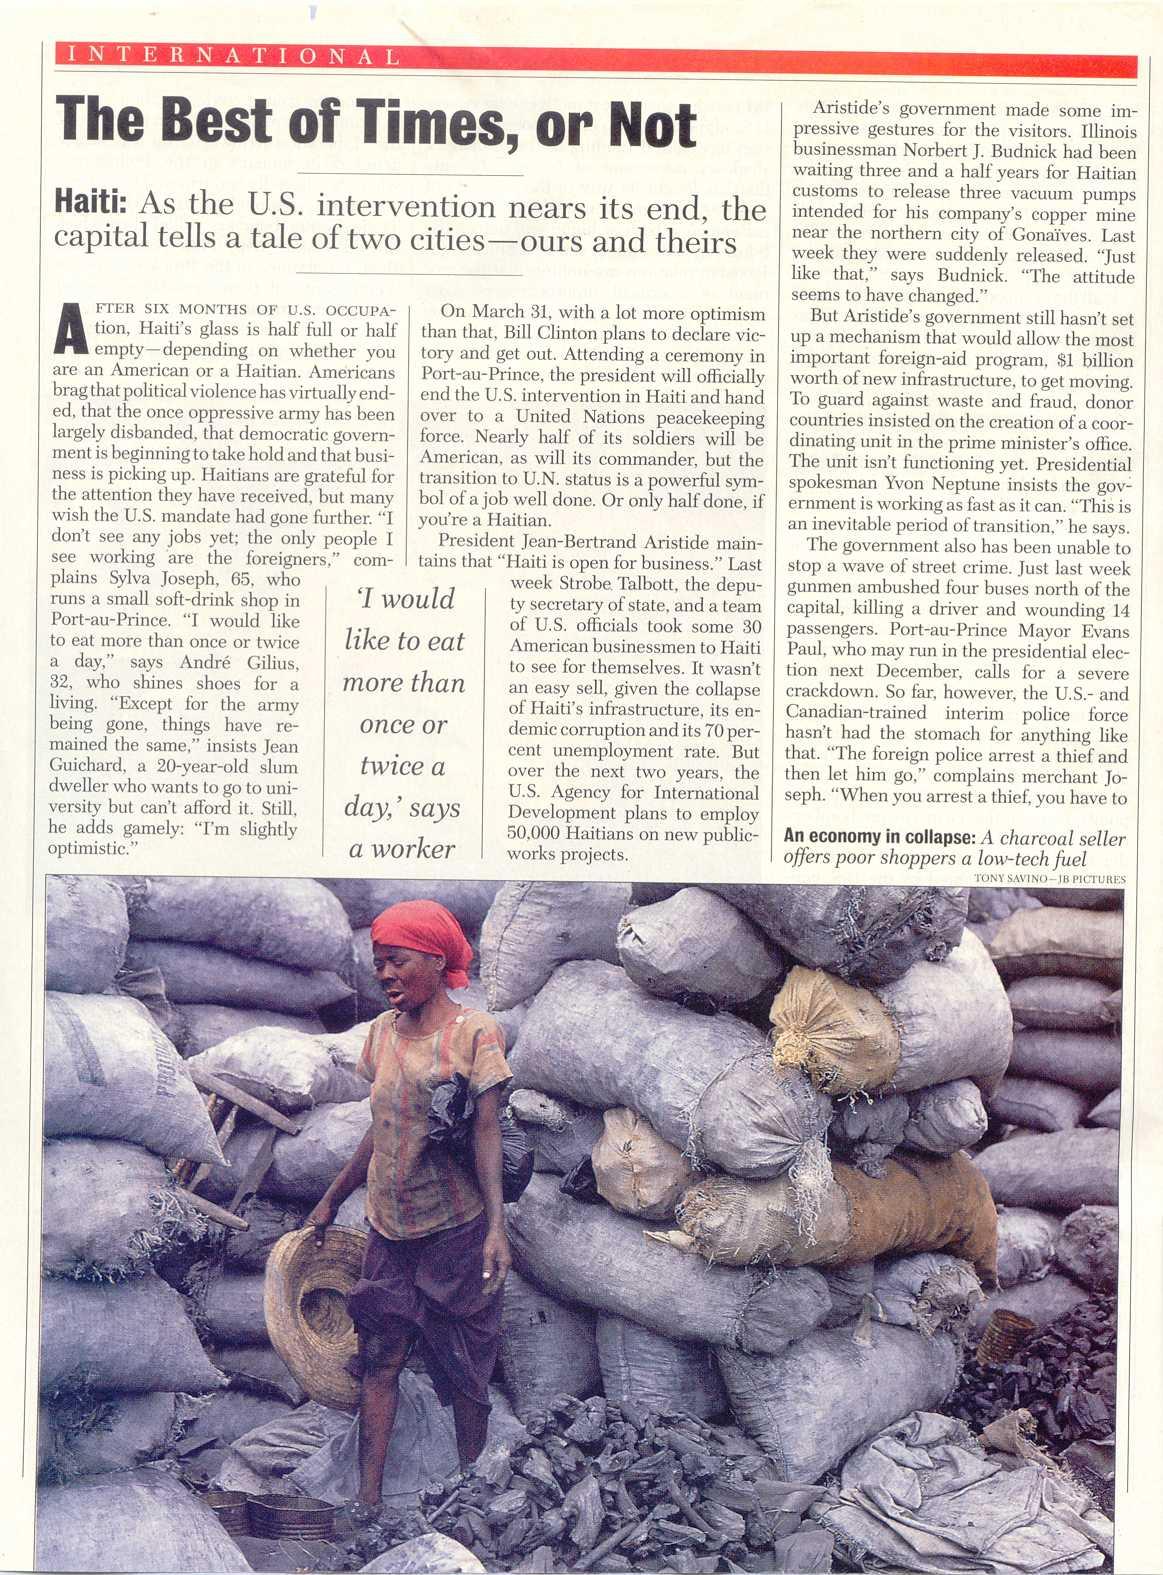 Peter Katel On The U.S. Occupation Of Haiti – Newsweek Magazine (1995)